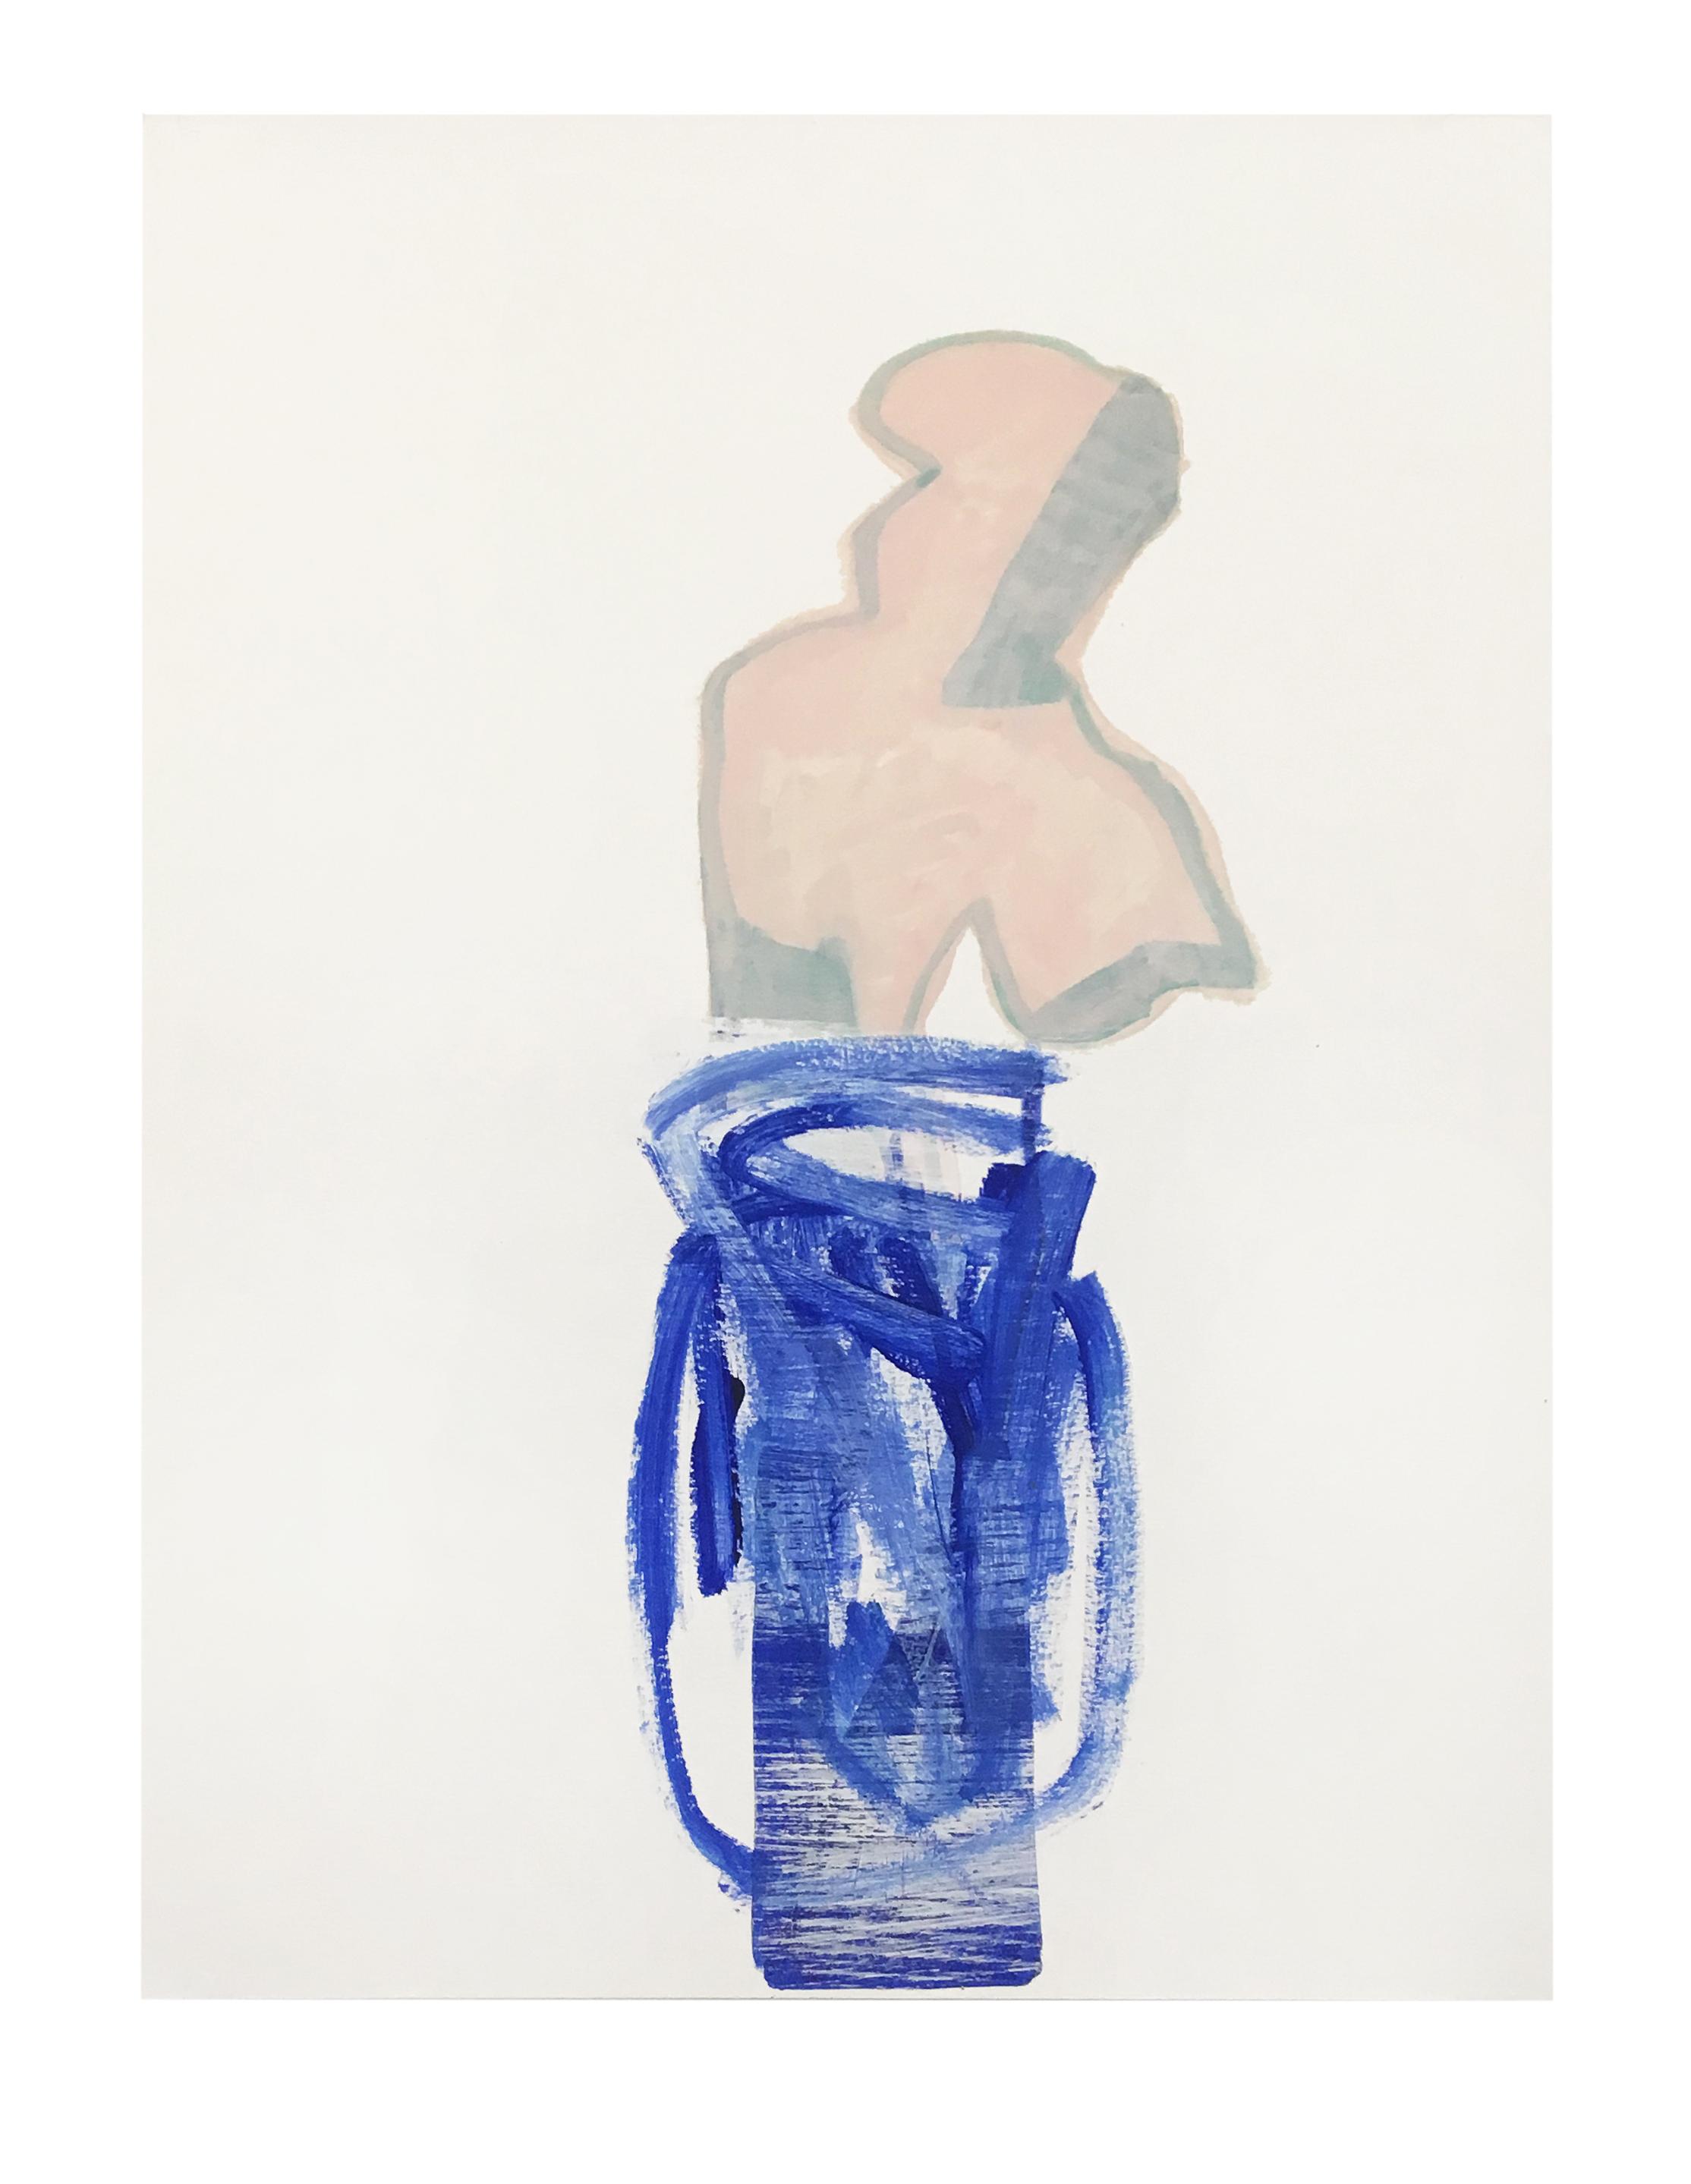 Sofia Quirno, Genie, 2014, acrylic on paper, 24 x 18 inch.JPG